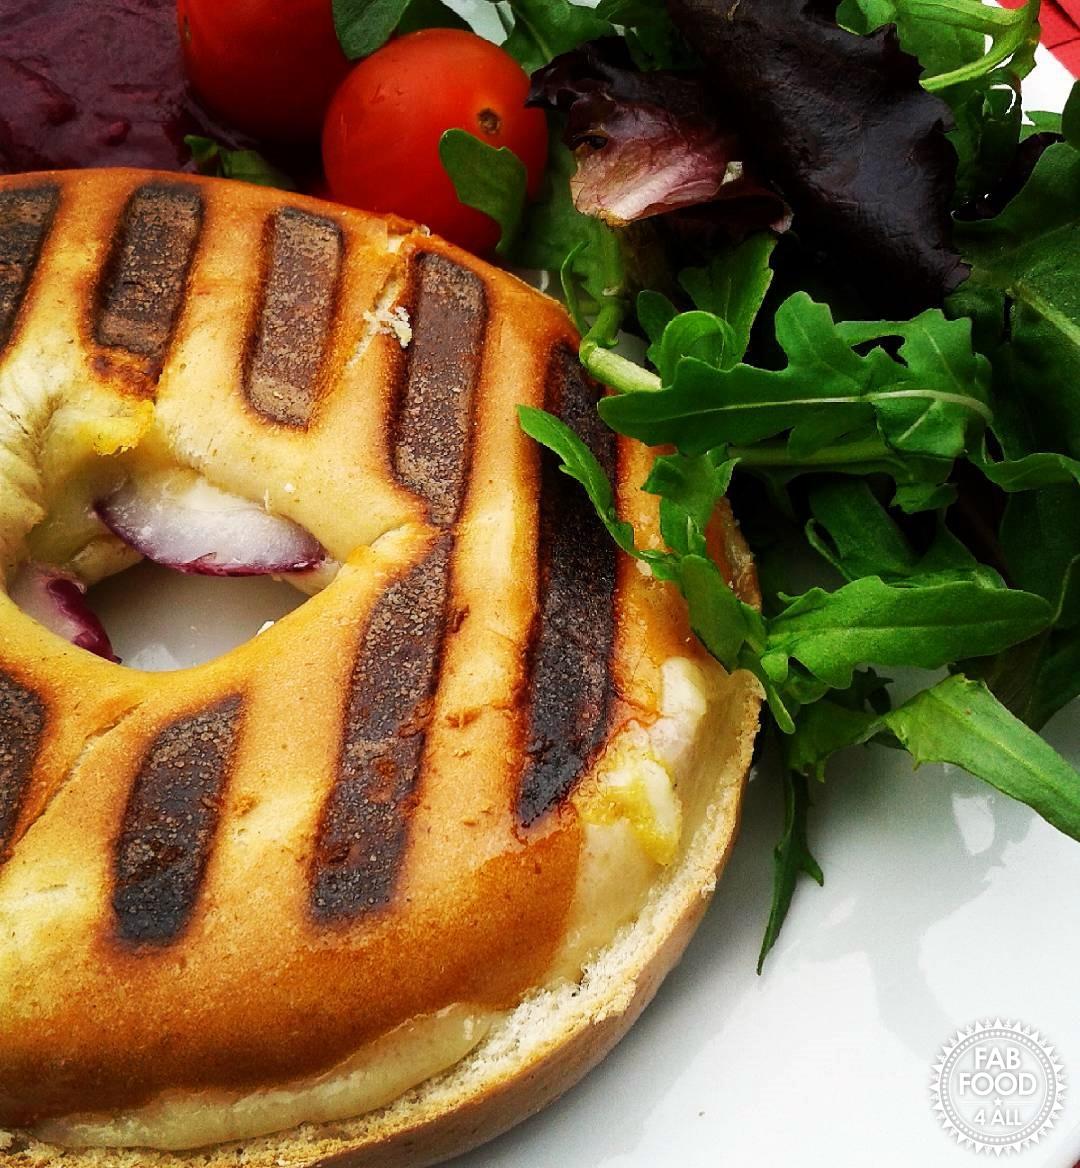 Tefal Optigrill Review - Fab Food 4 All